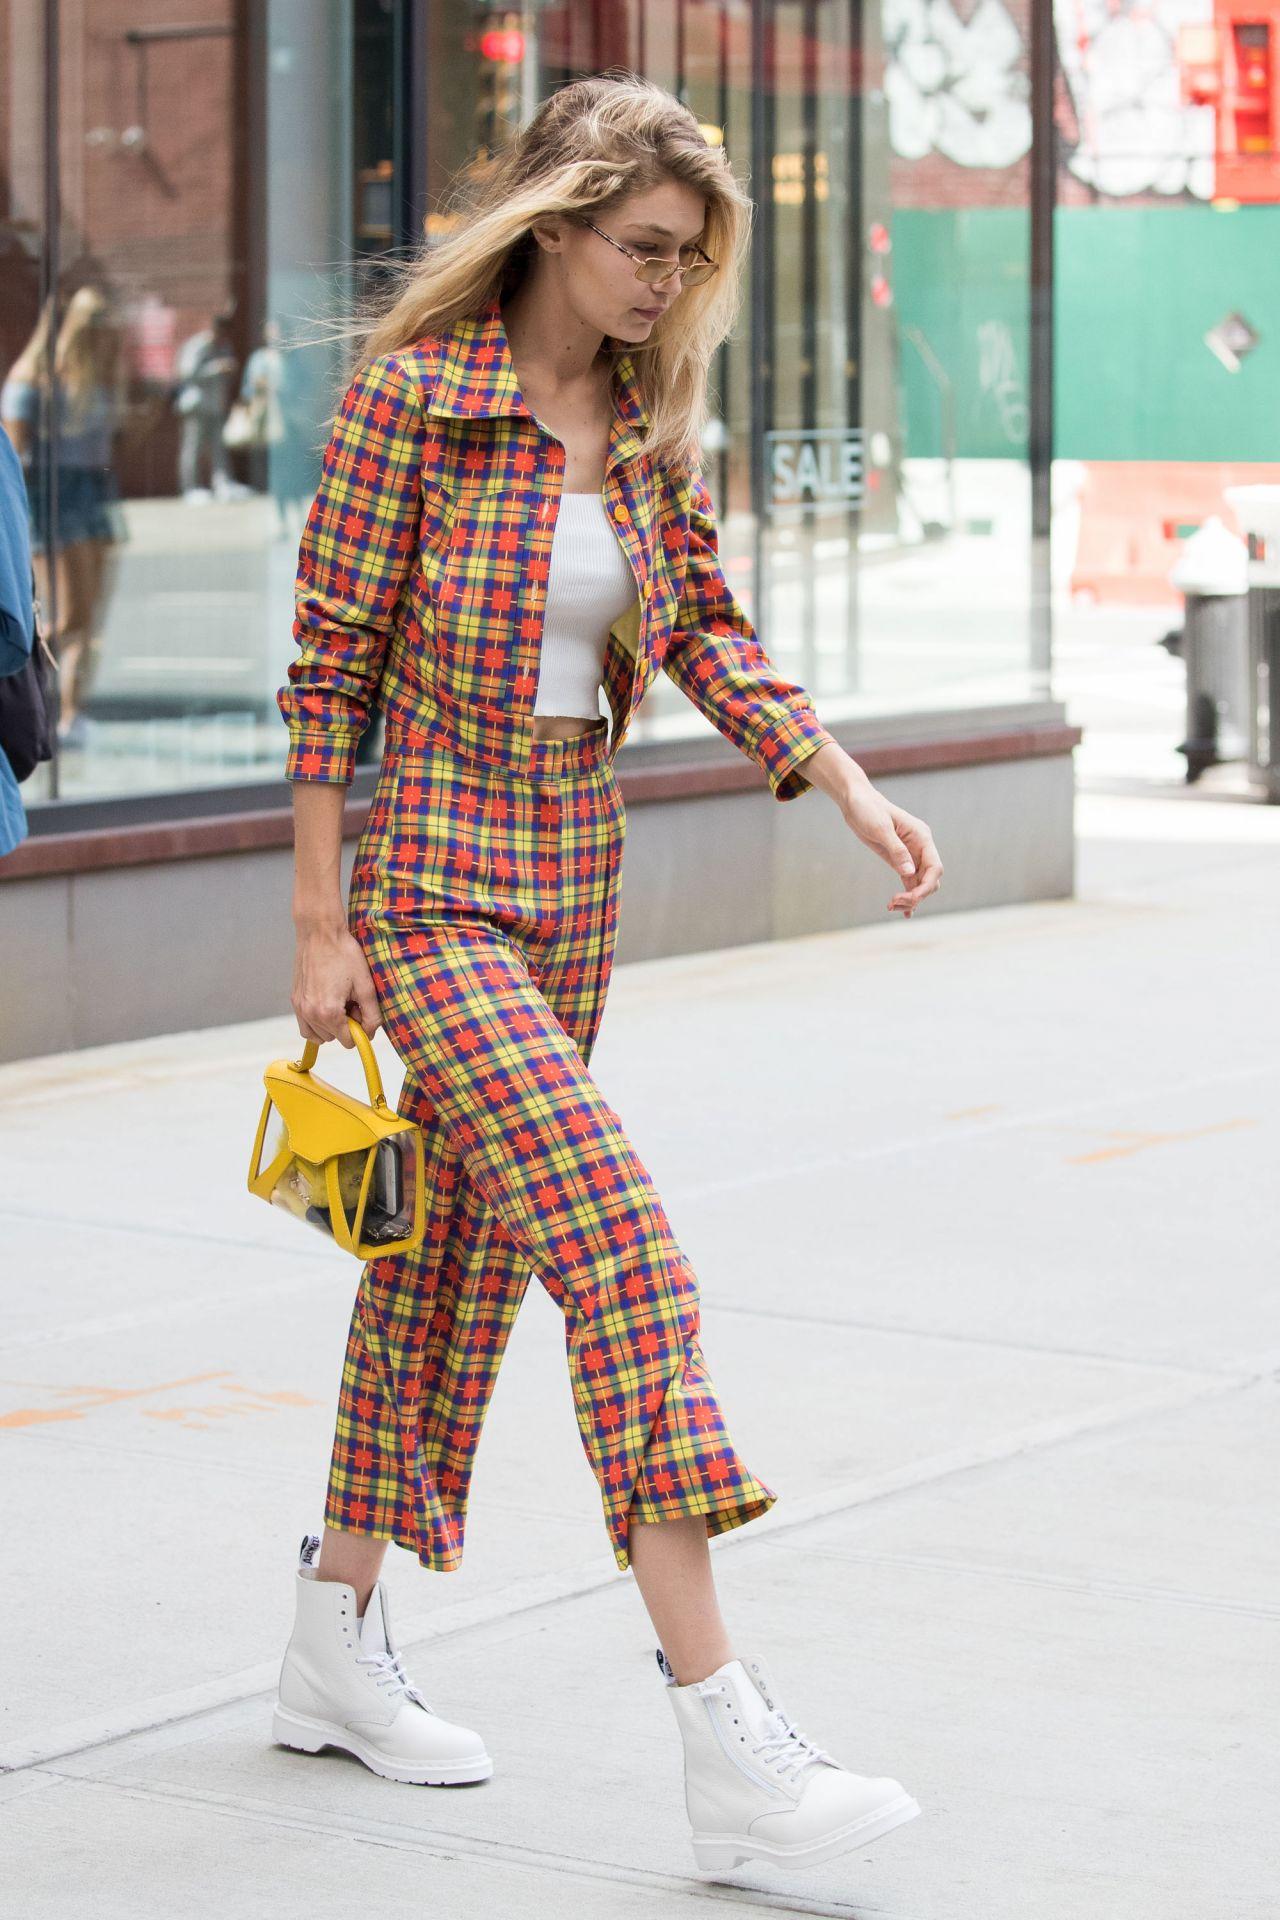 Gigi Hadid Street Fashion - New York City 09/08/2017